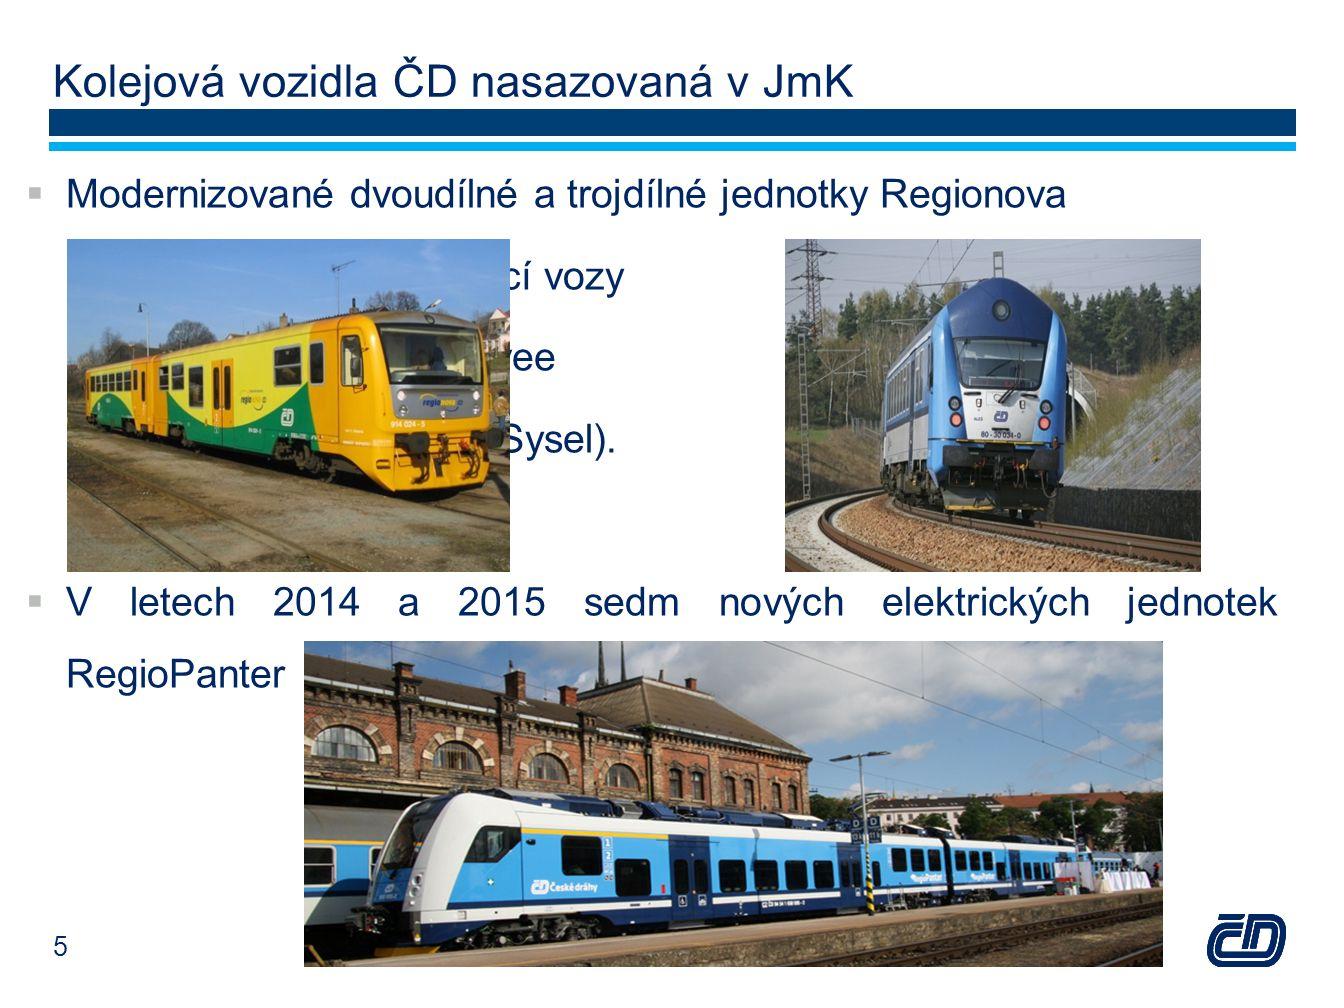 Kolejová vozidla ČD nasazovaná v JmK  Modernizované dvoudílné a trojdílné jednotky Regionova a řídící vozy Bfhpvee (tzv.